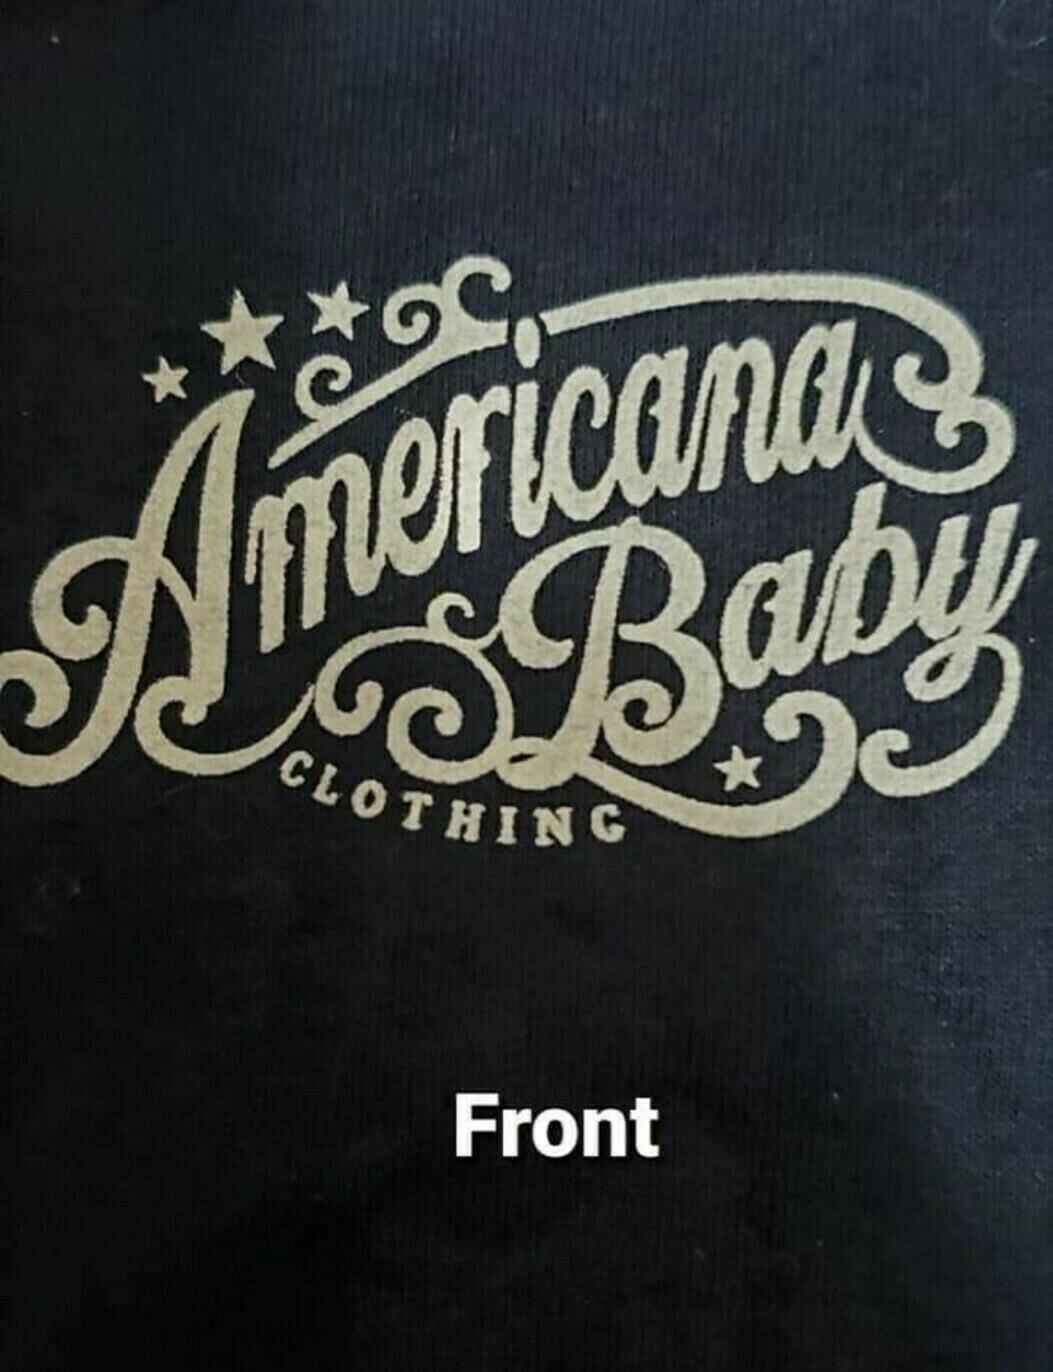 Americana Baby American Dream Shirt LG